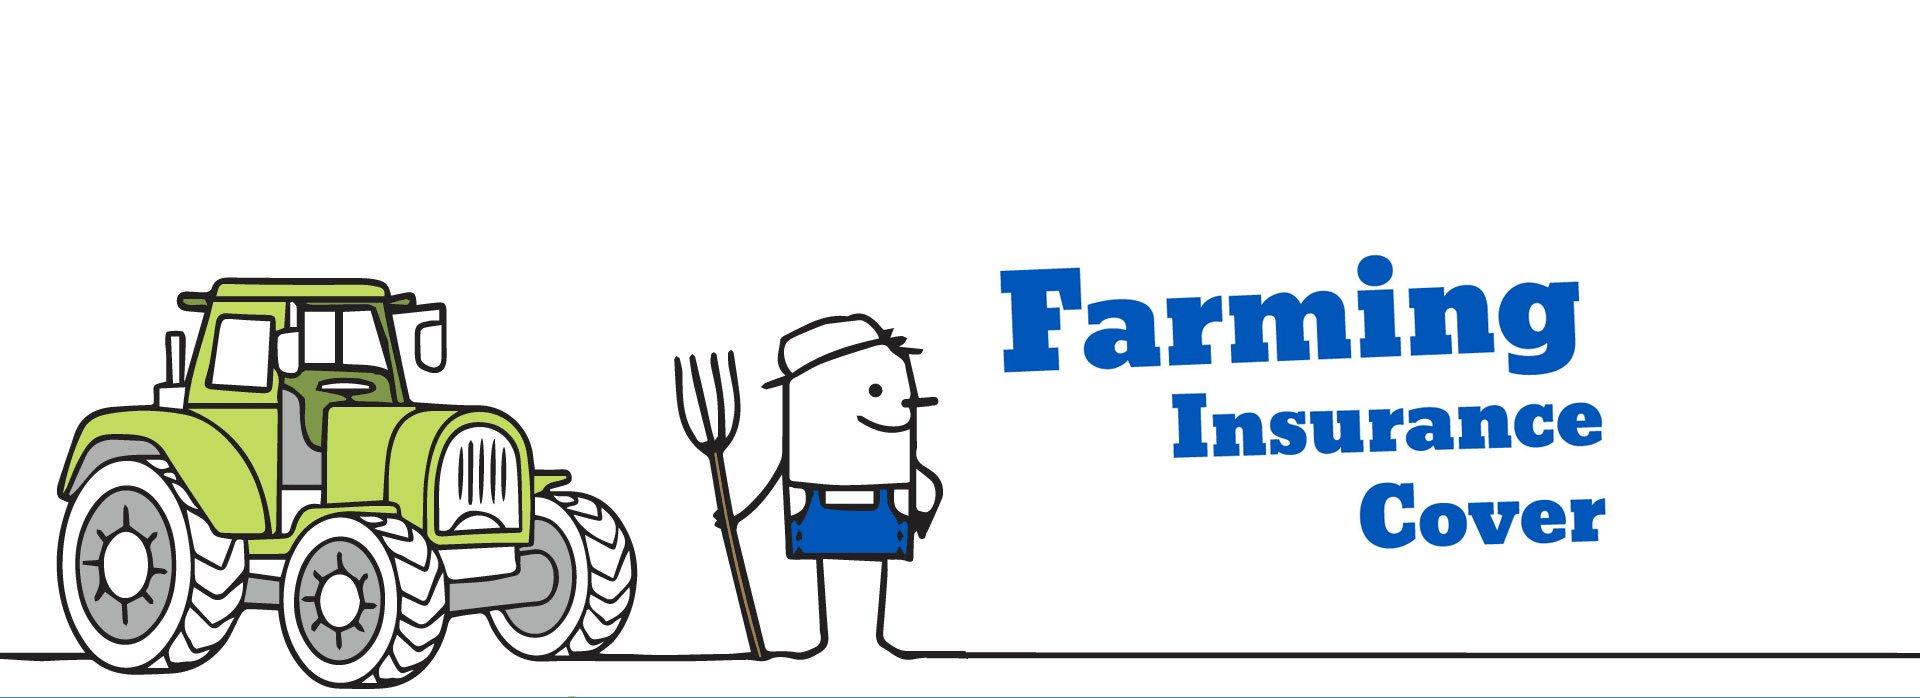 Farming insurance cover graphic